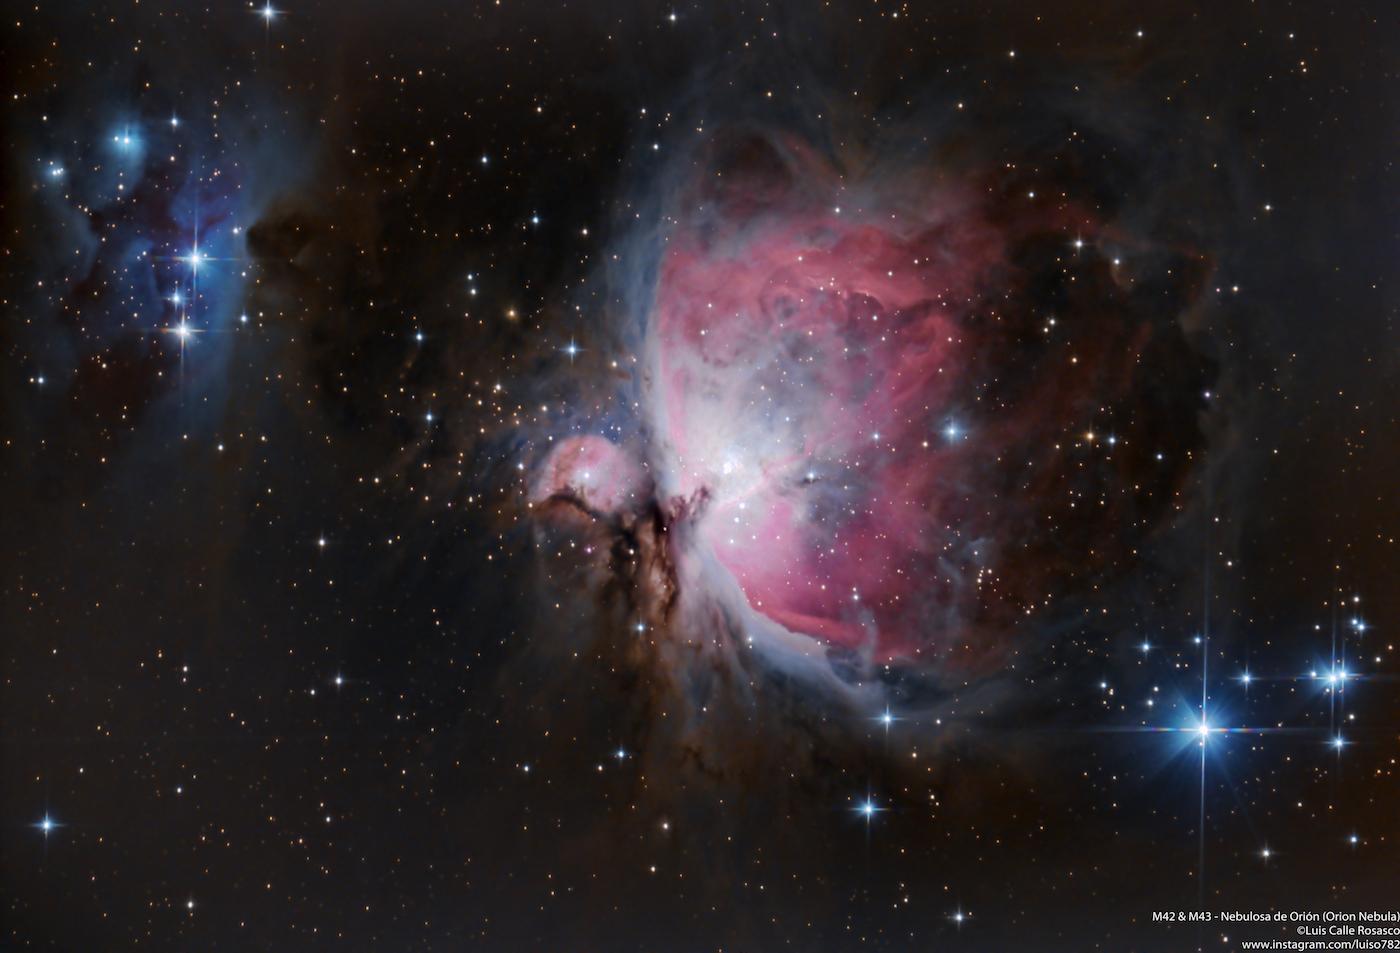 Imagen de la nebulosa de ori n messier 42 tomada desde lima per el universo hoy - Calle nebulosas madrid ...